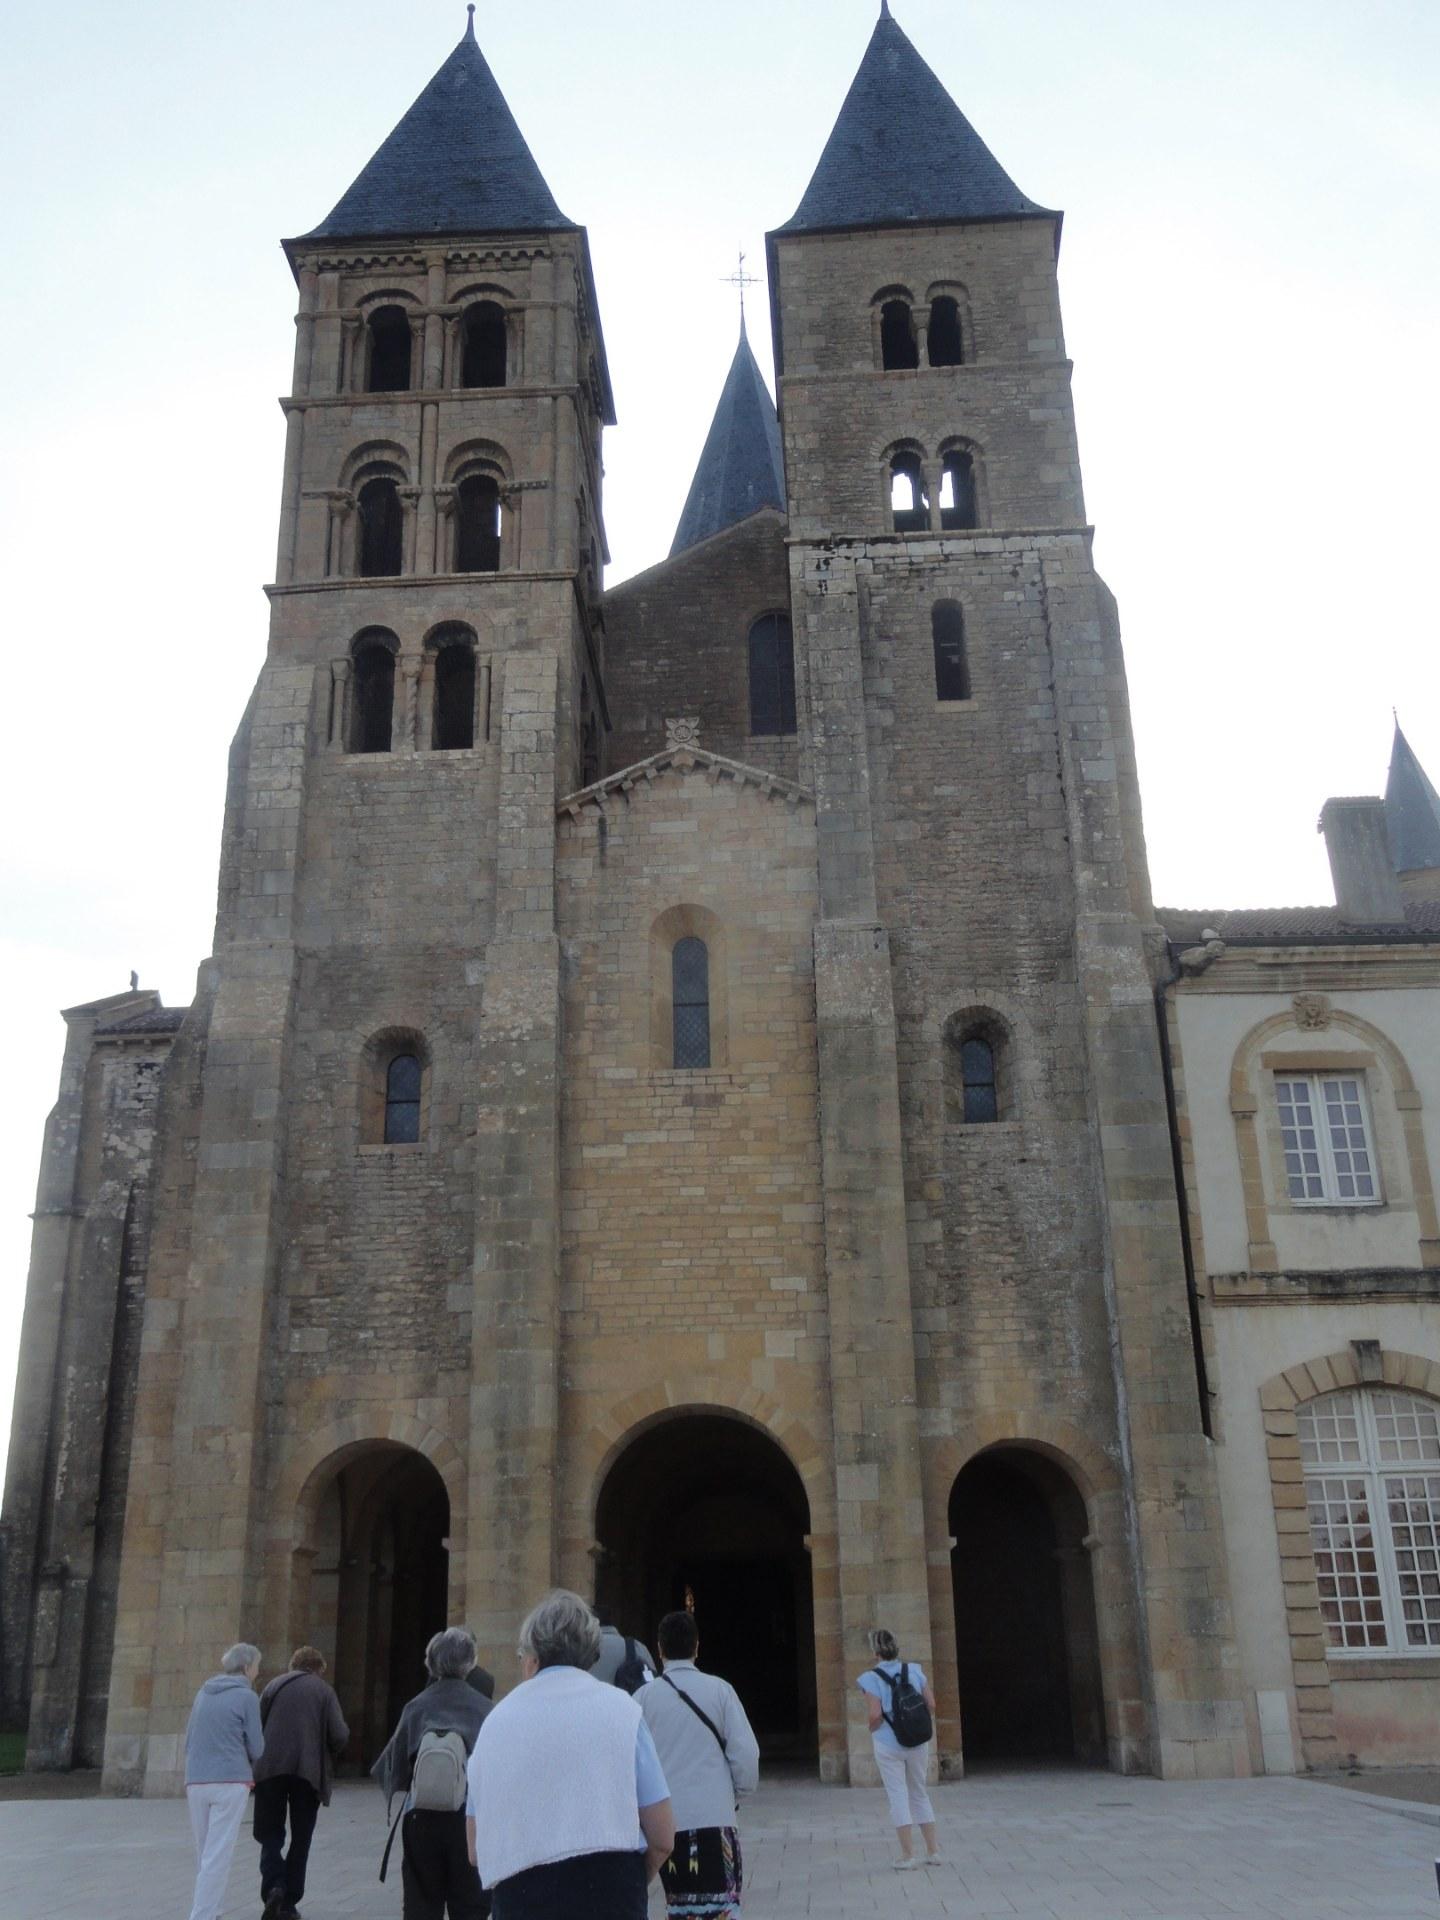 2017-06-16 - Pe#lerinage en Bourgogne - 088